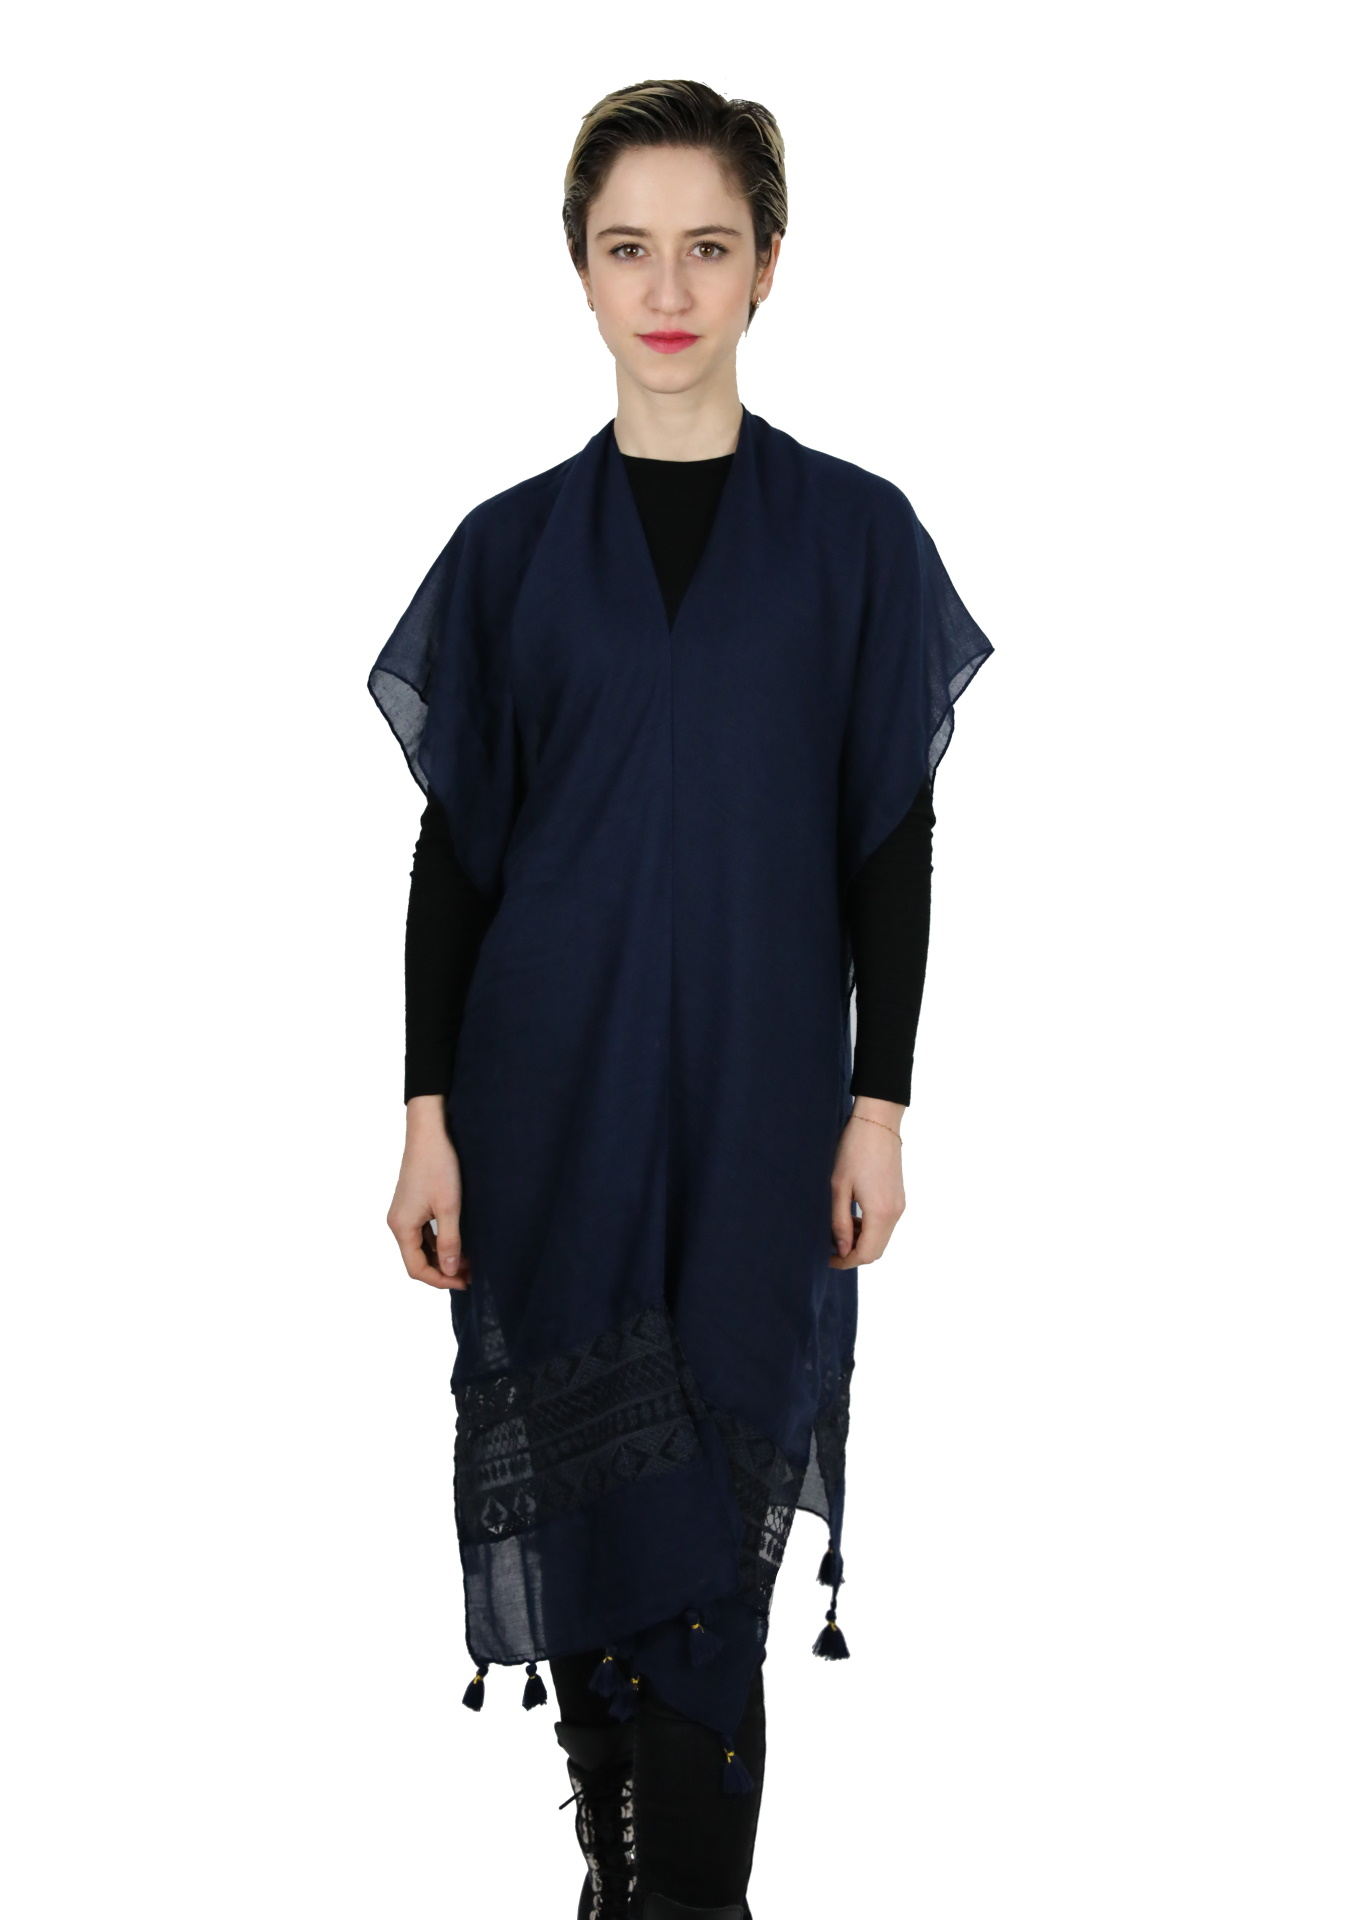 CLOTHES17/6 STOLA DONNA FOULARD CARDIGAN COPRISPALLE